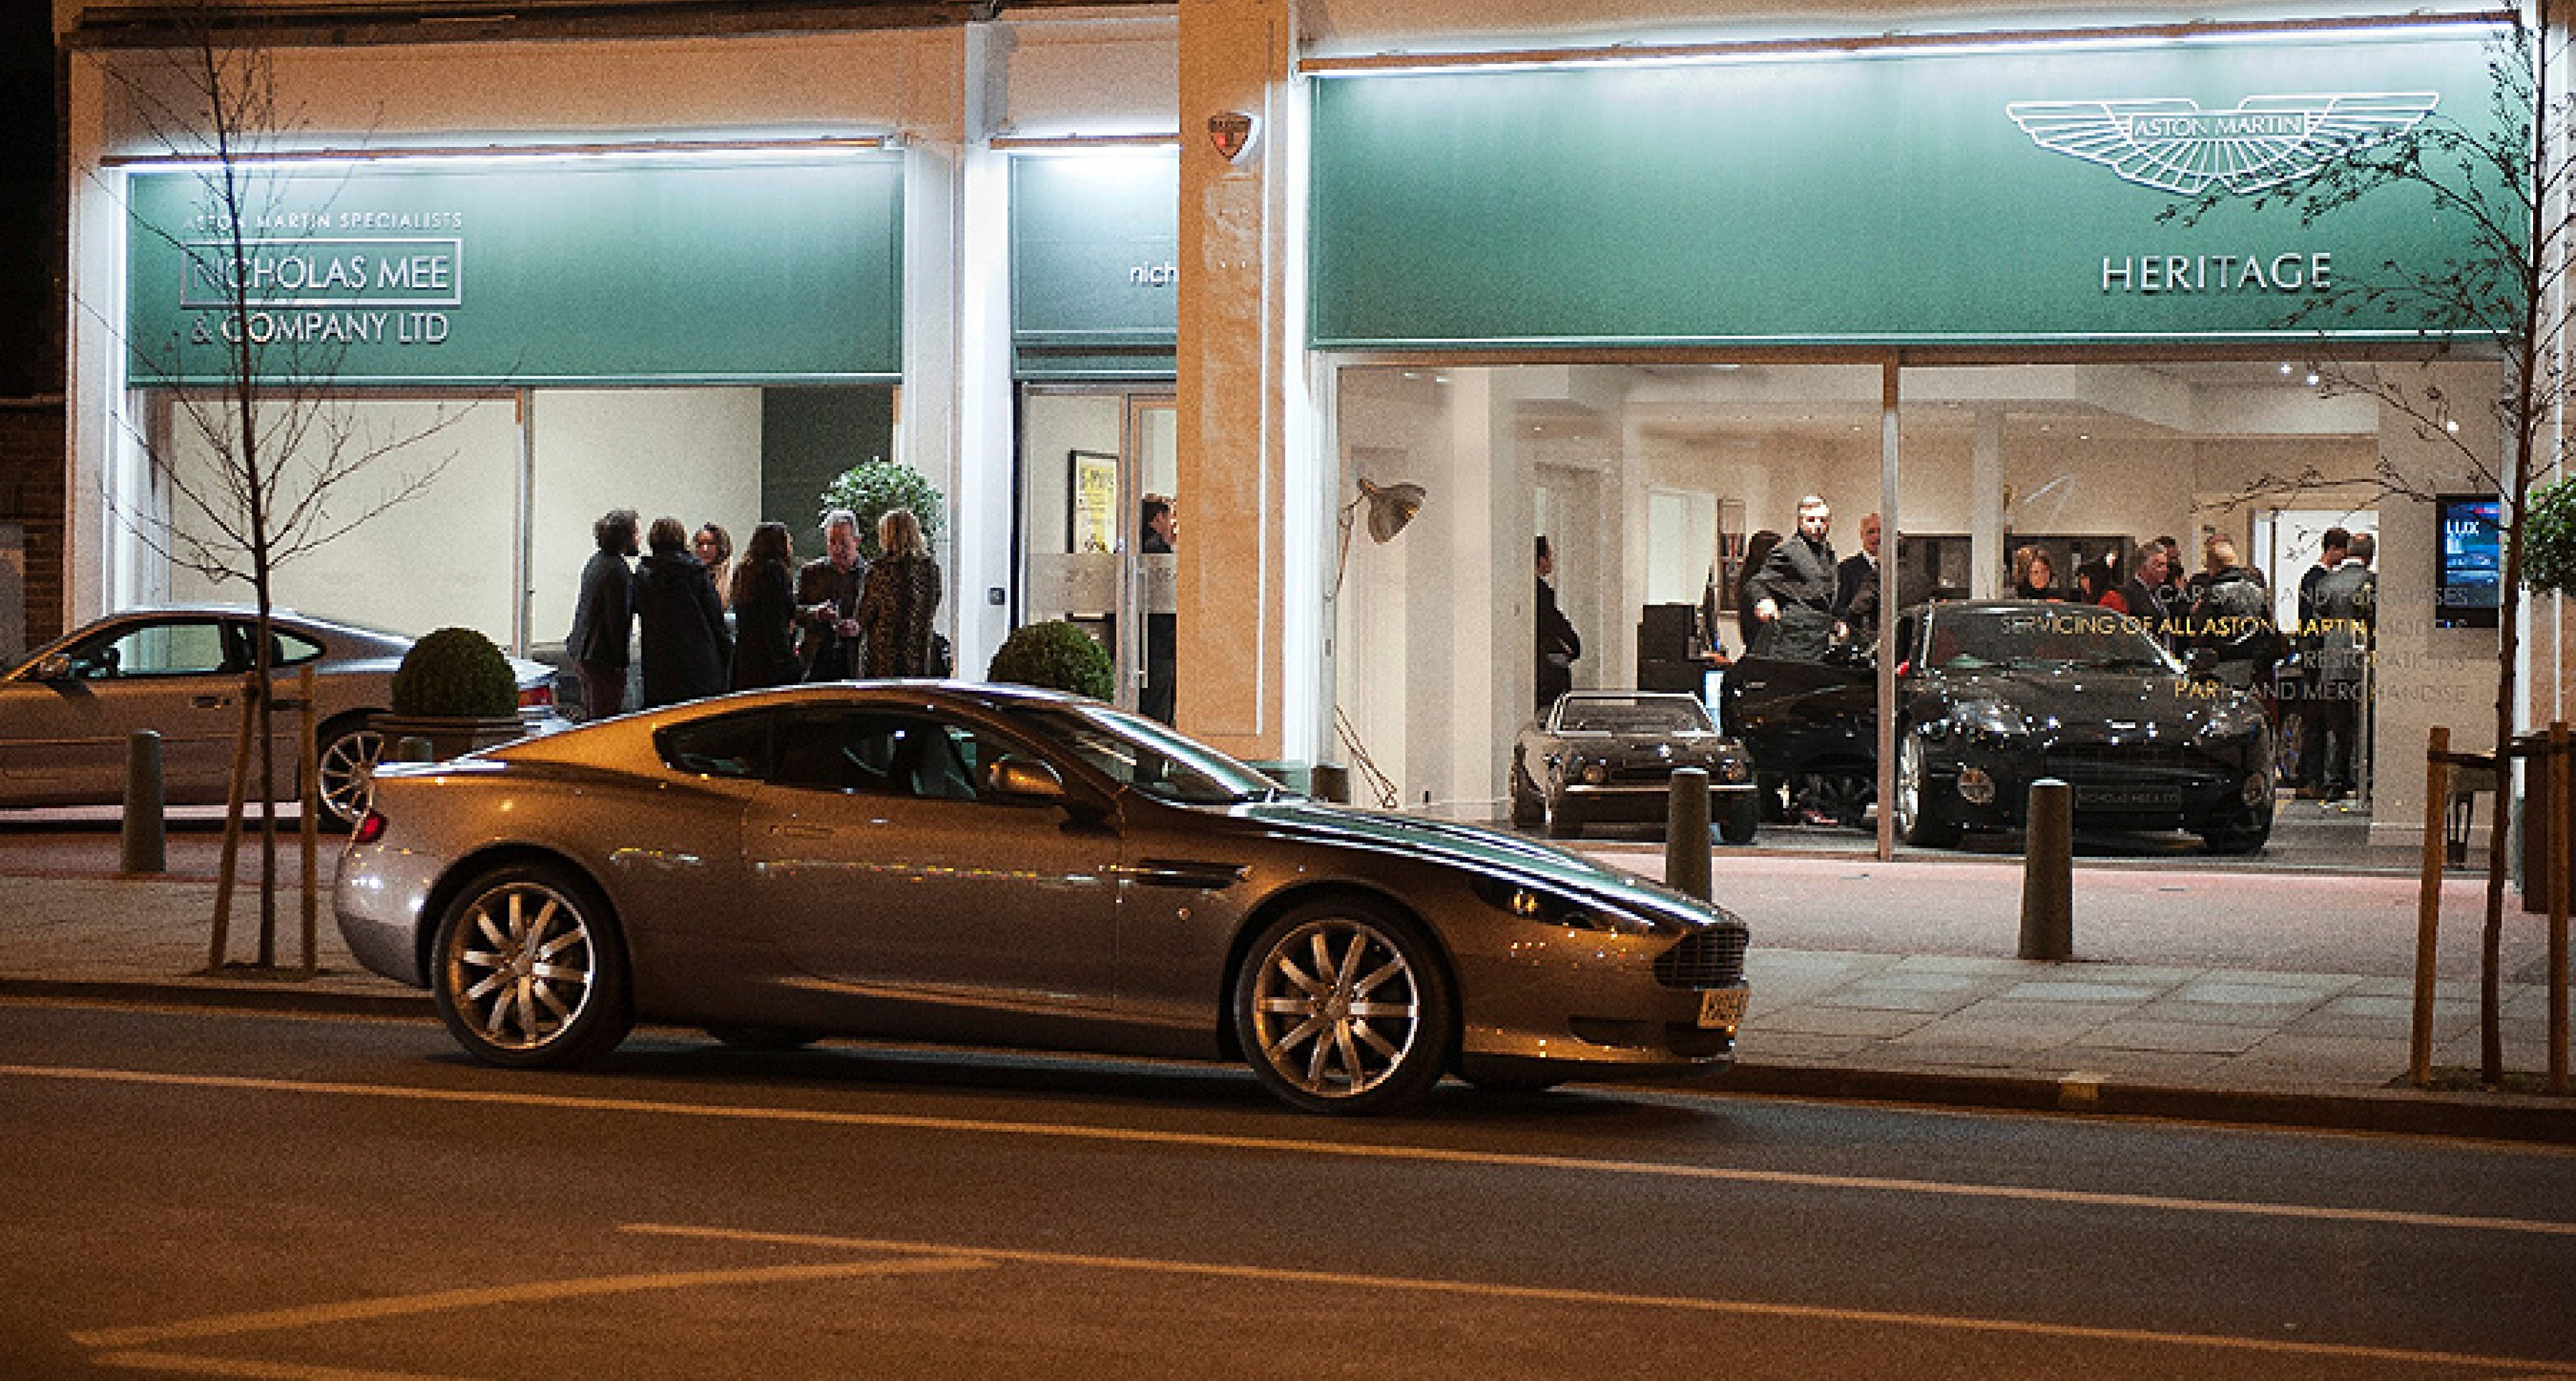 Großbritanniens erster Aston Martin Heritage Showroom eröffnet in West London